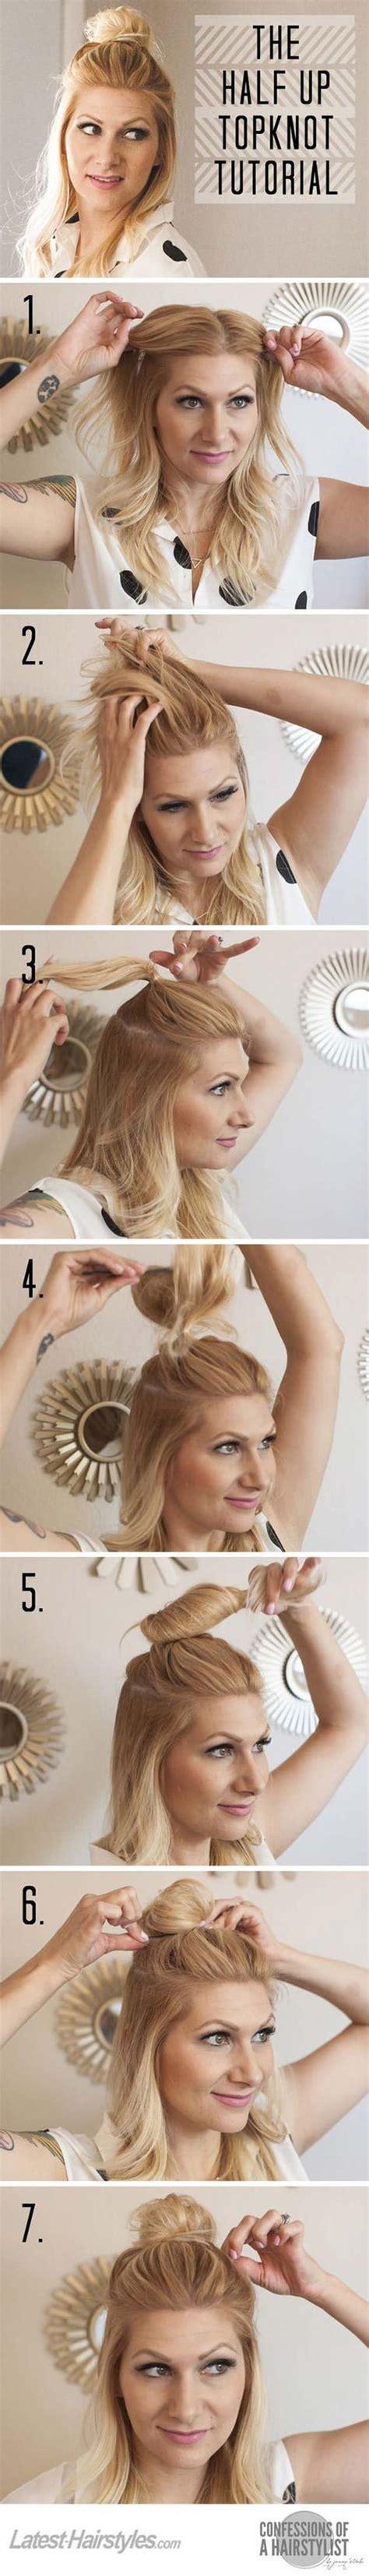 700 best hair brained images on pinterest beauty hacks